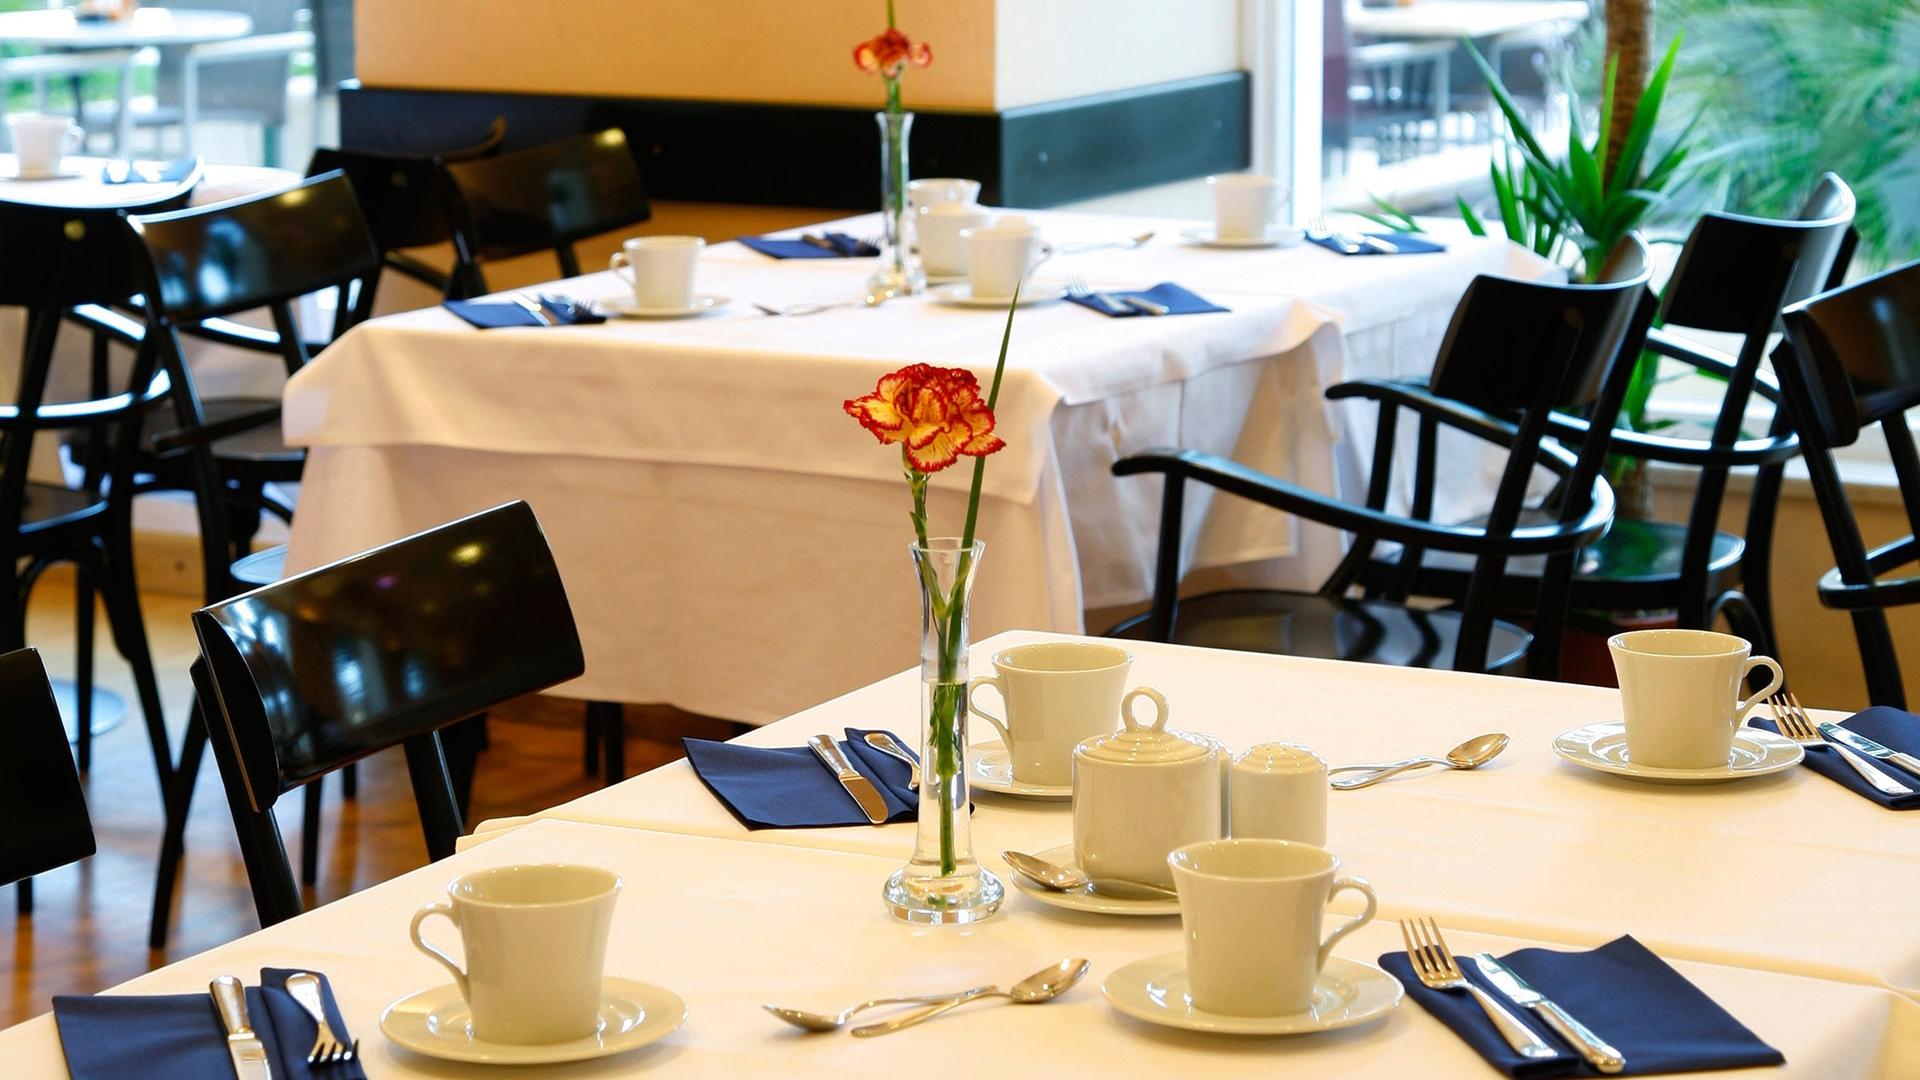 Download wallpaper restaurant table appliances